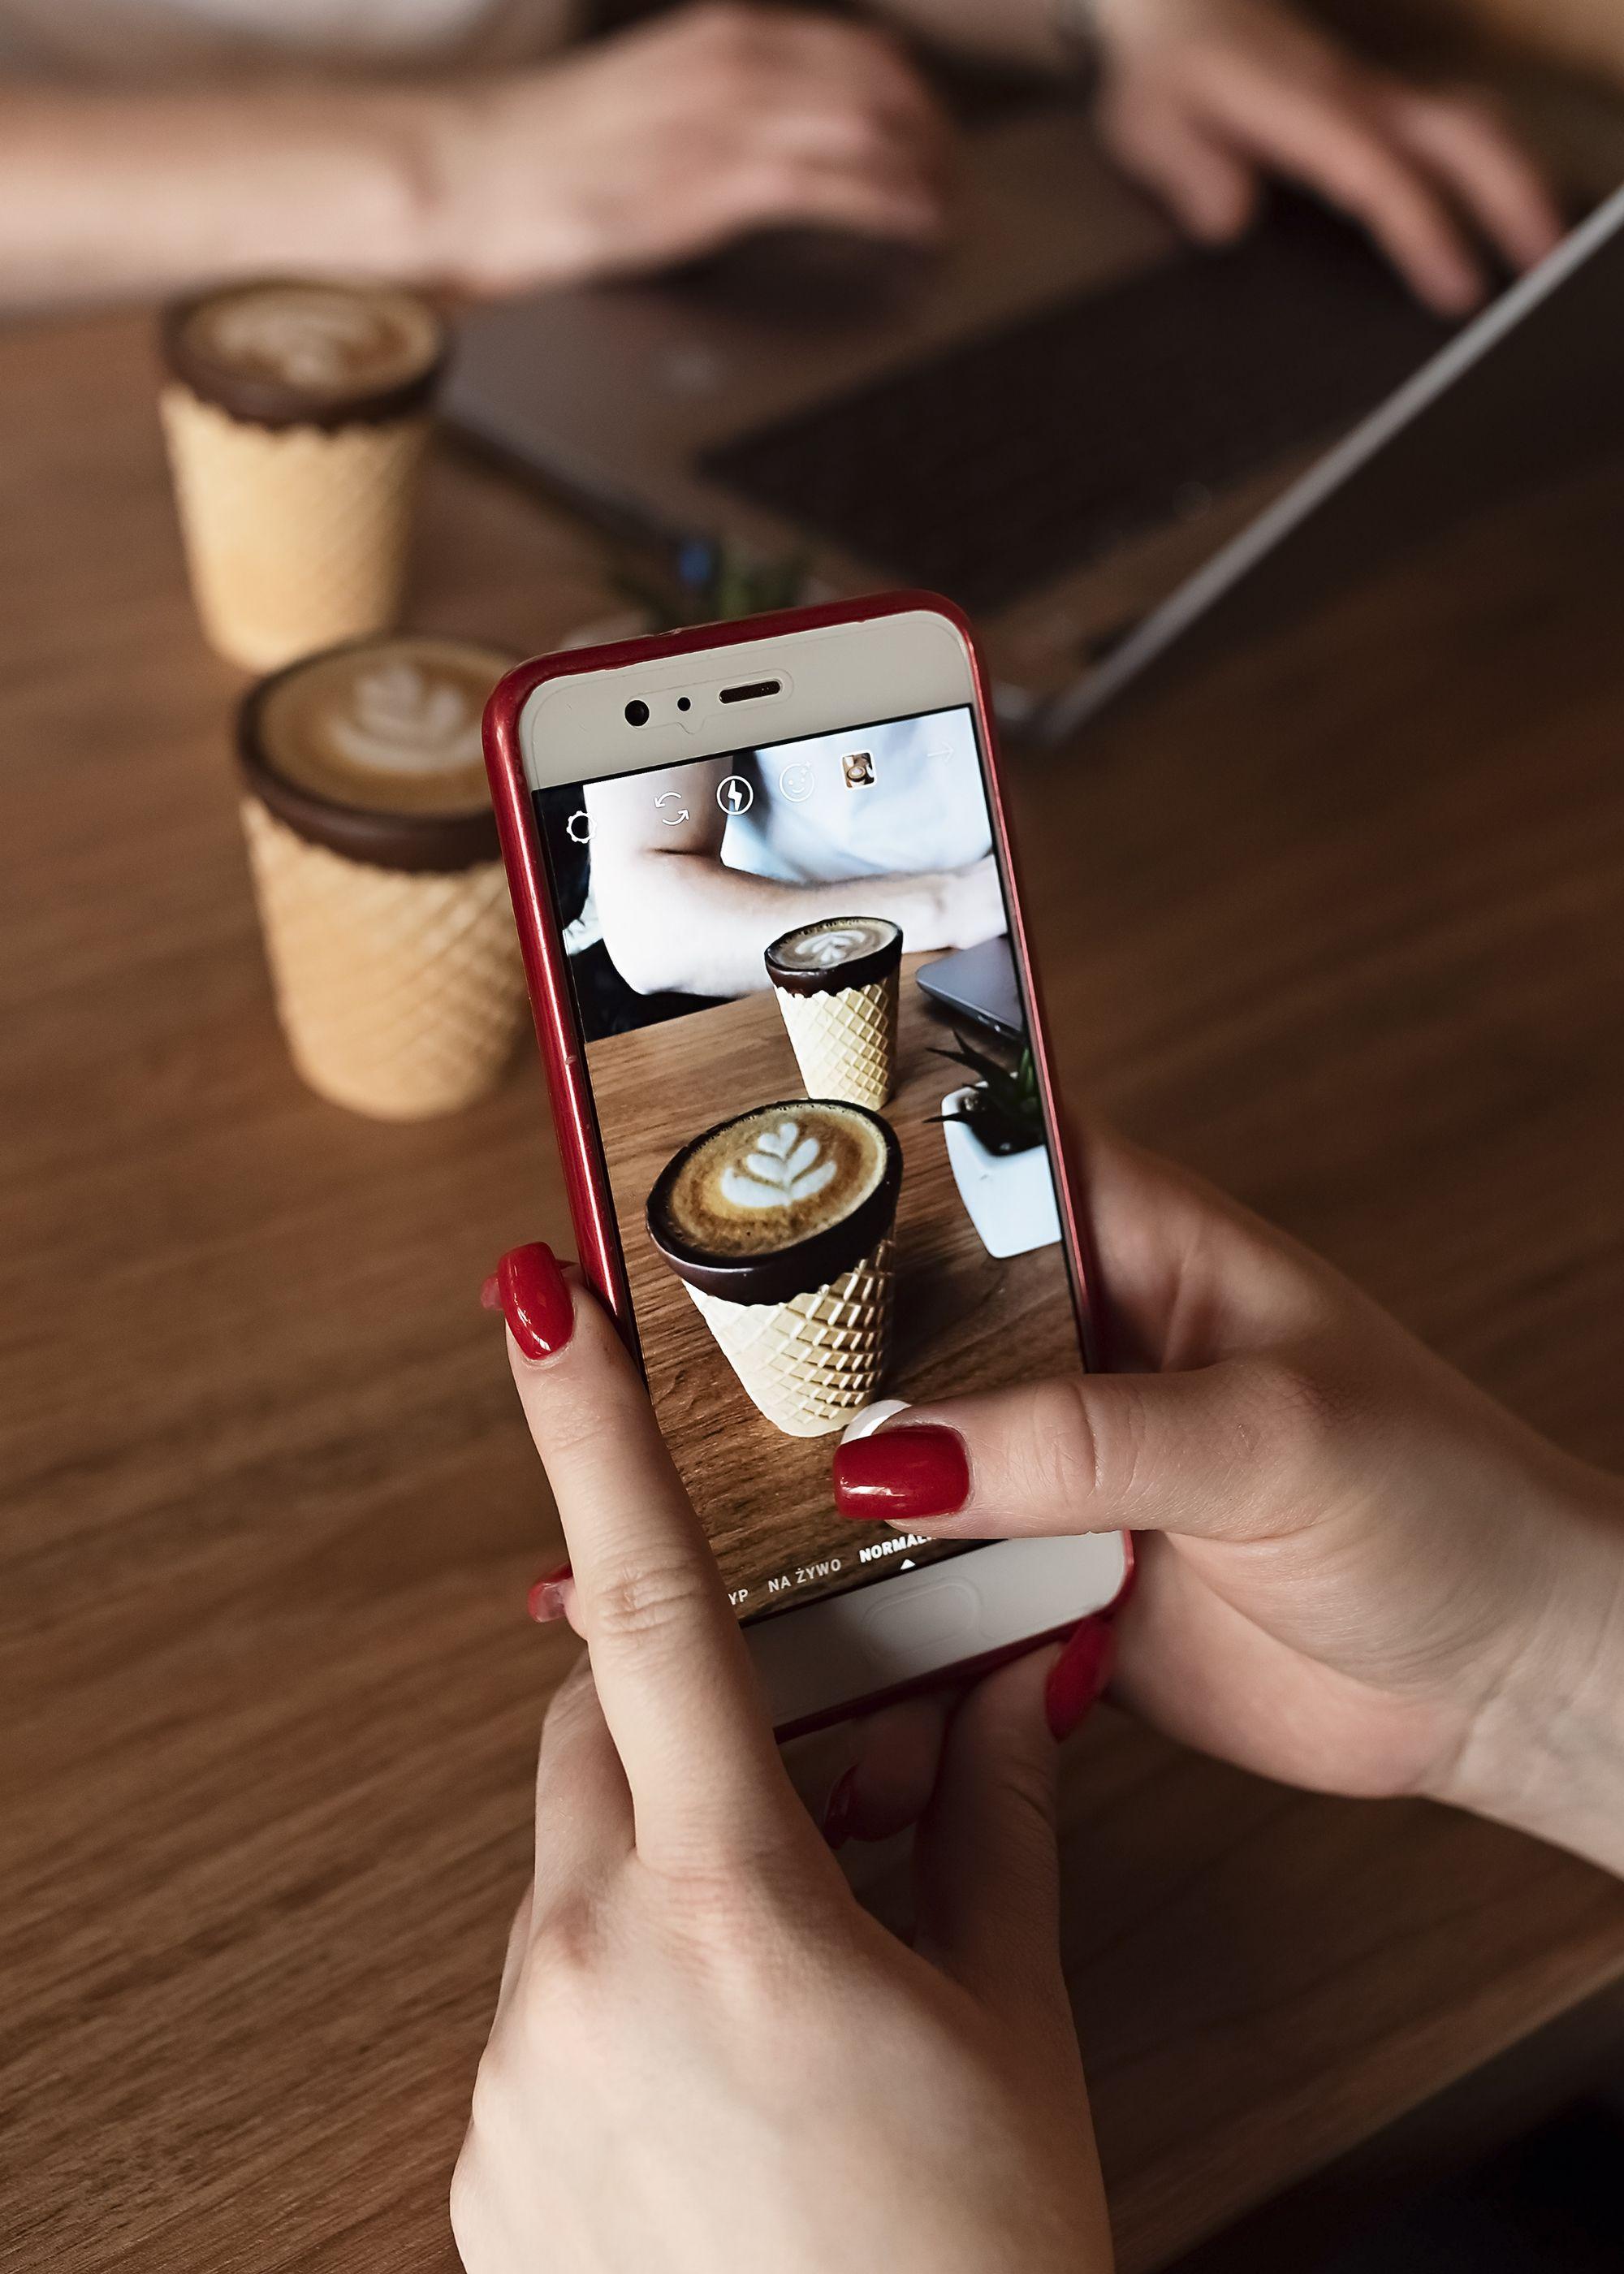 Pin By Konesso Pl On Slodkosci Latte Art Latte Phone Ring